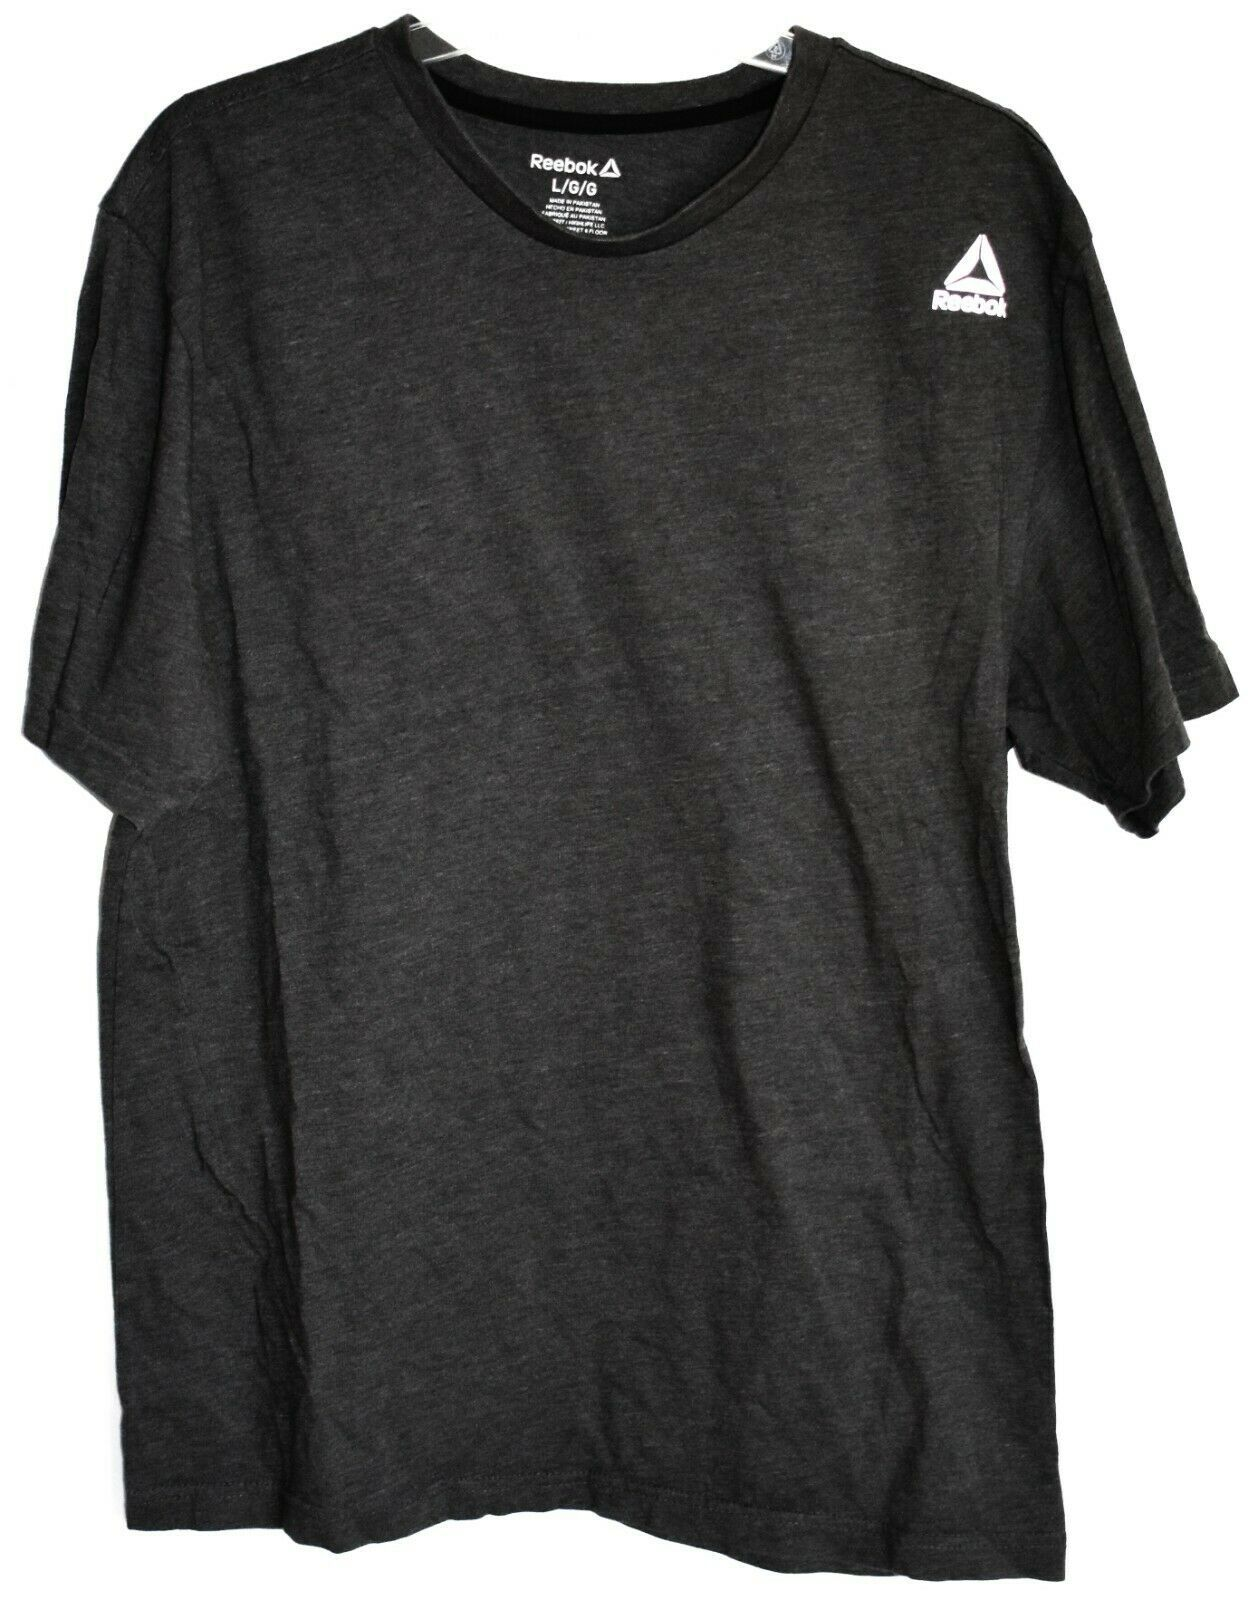 Reebok Men's Dark Gray Cotton Blend Crew Neck T-Shirt Size L